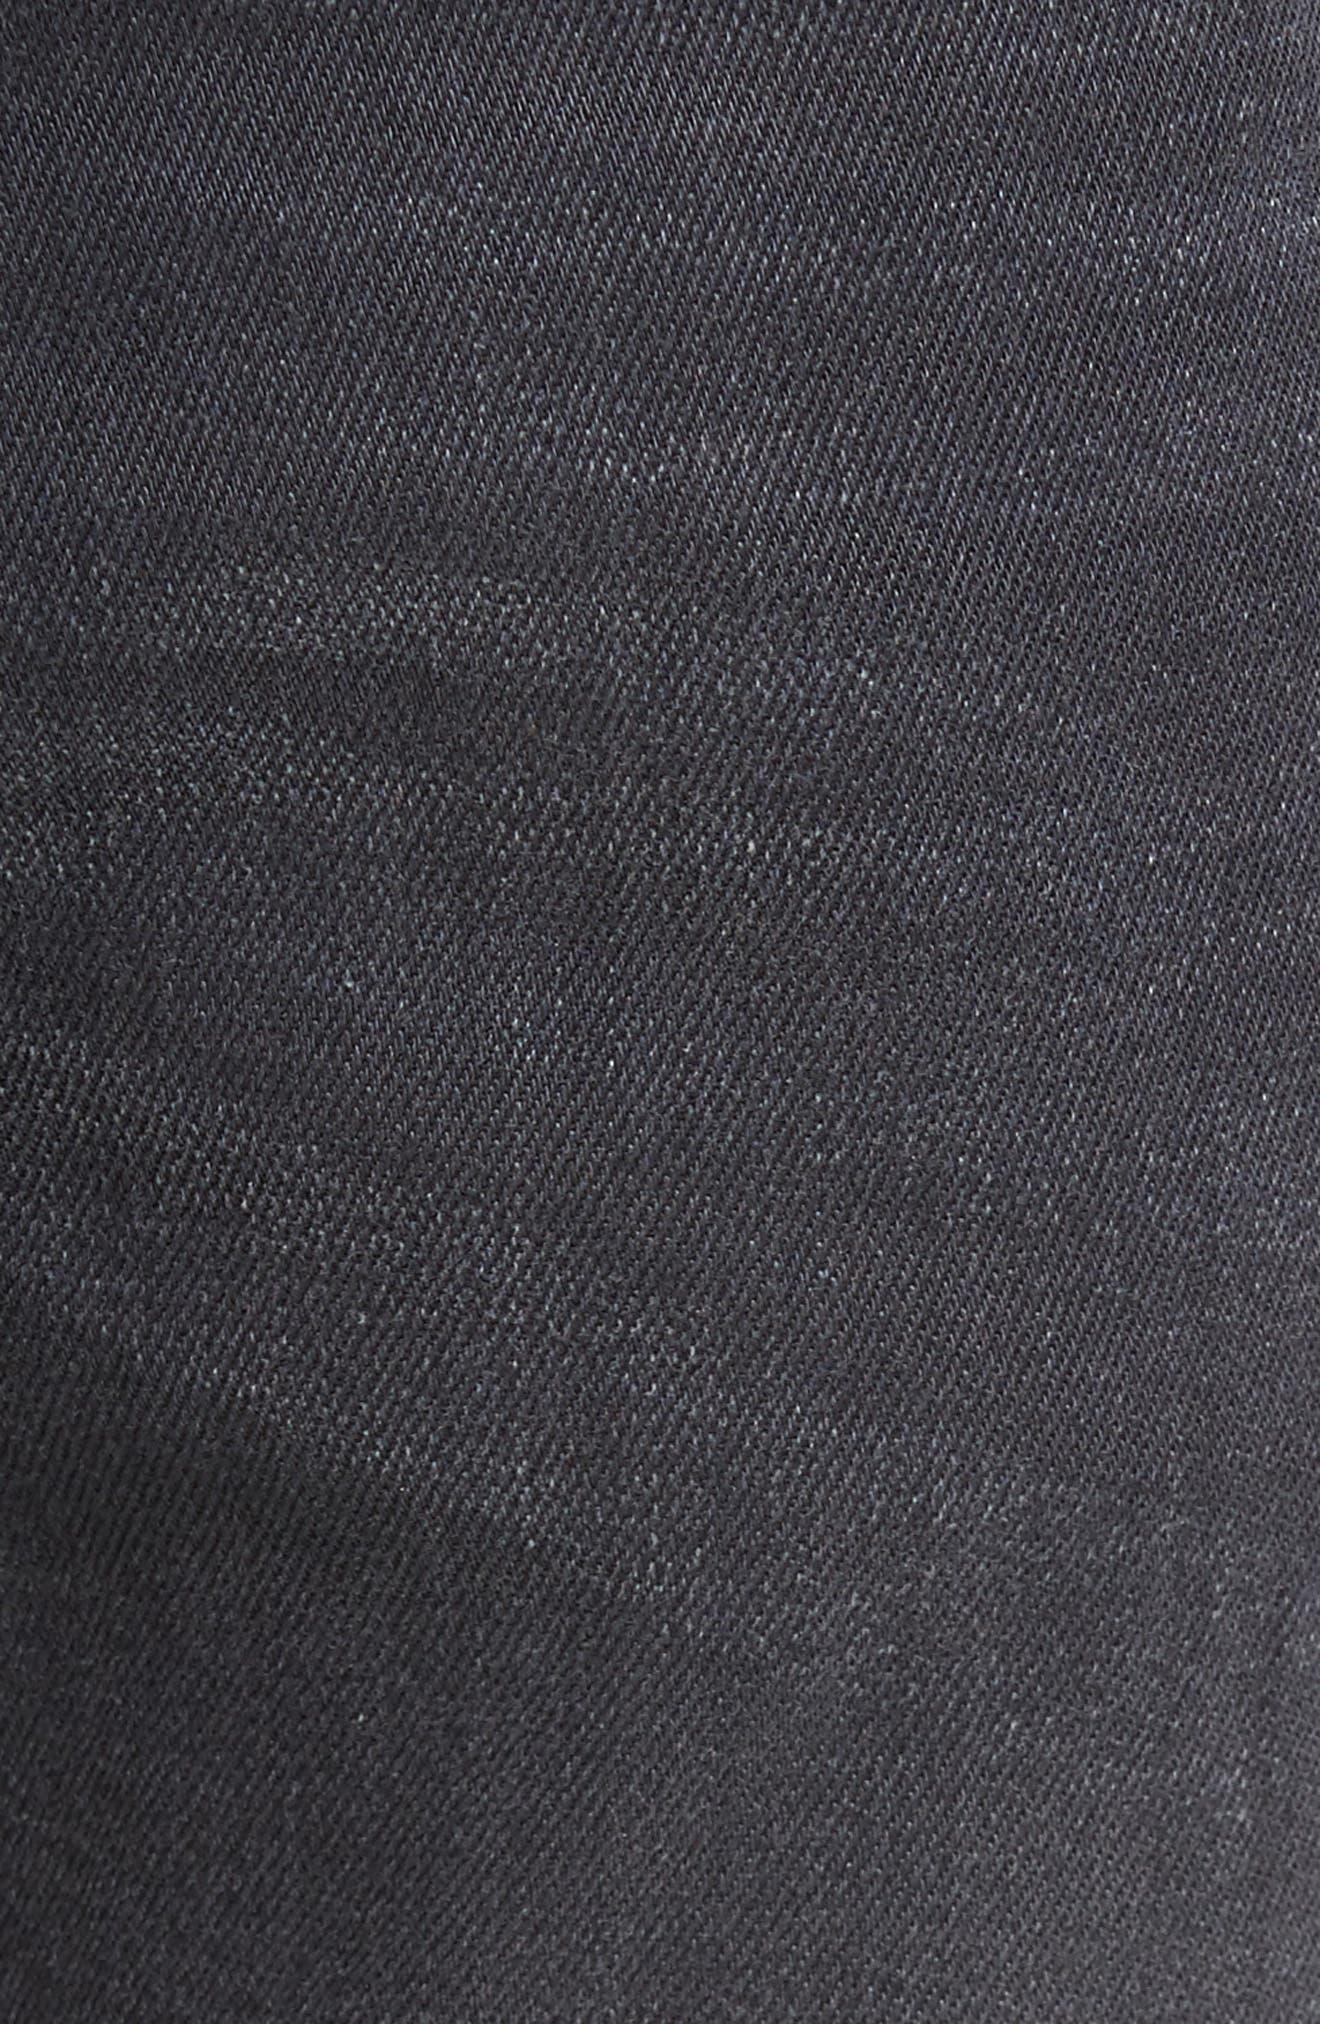 Thommer Slim Fit Jeans,                             Alternate thumbnail 2, color,